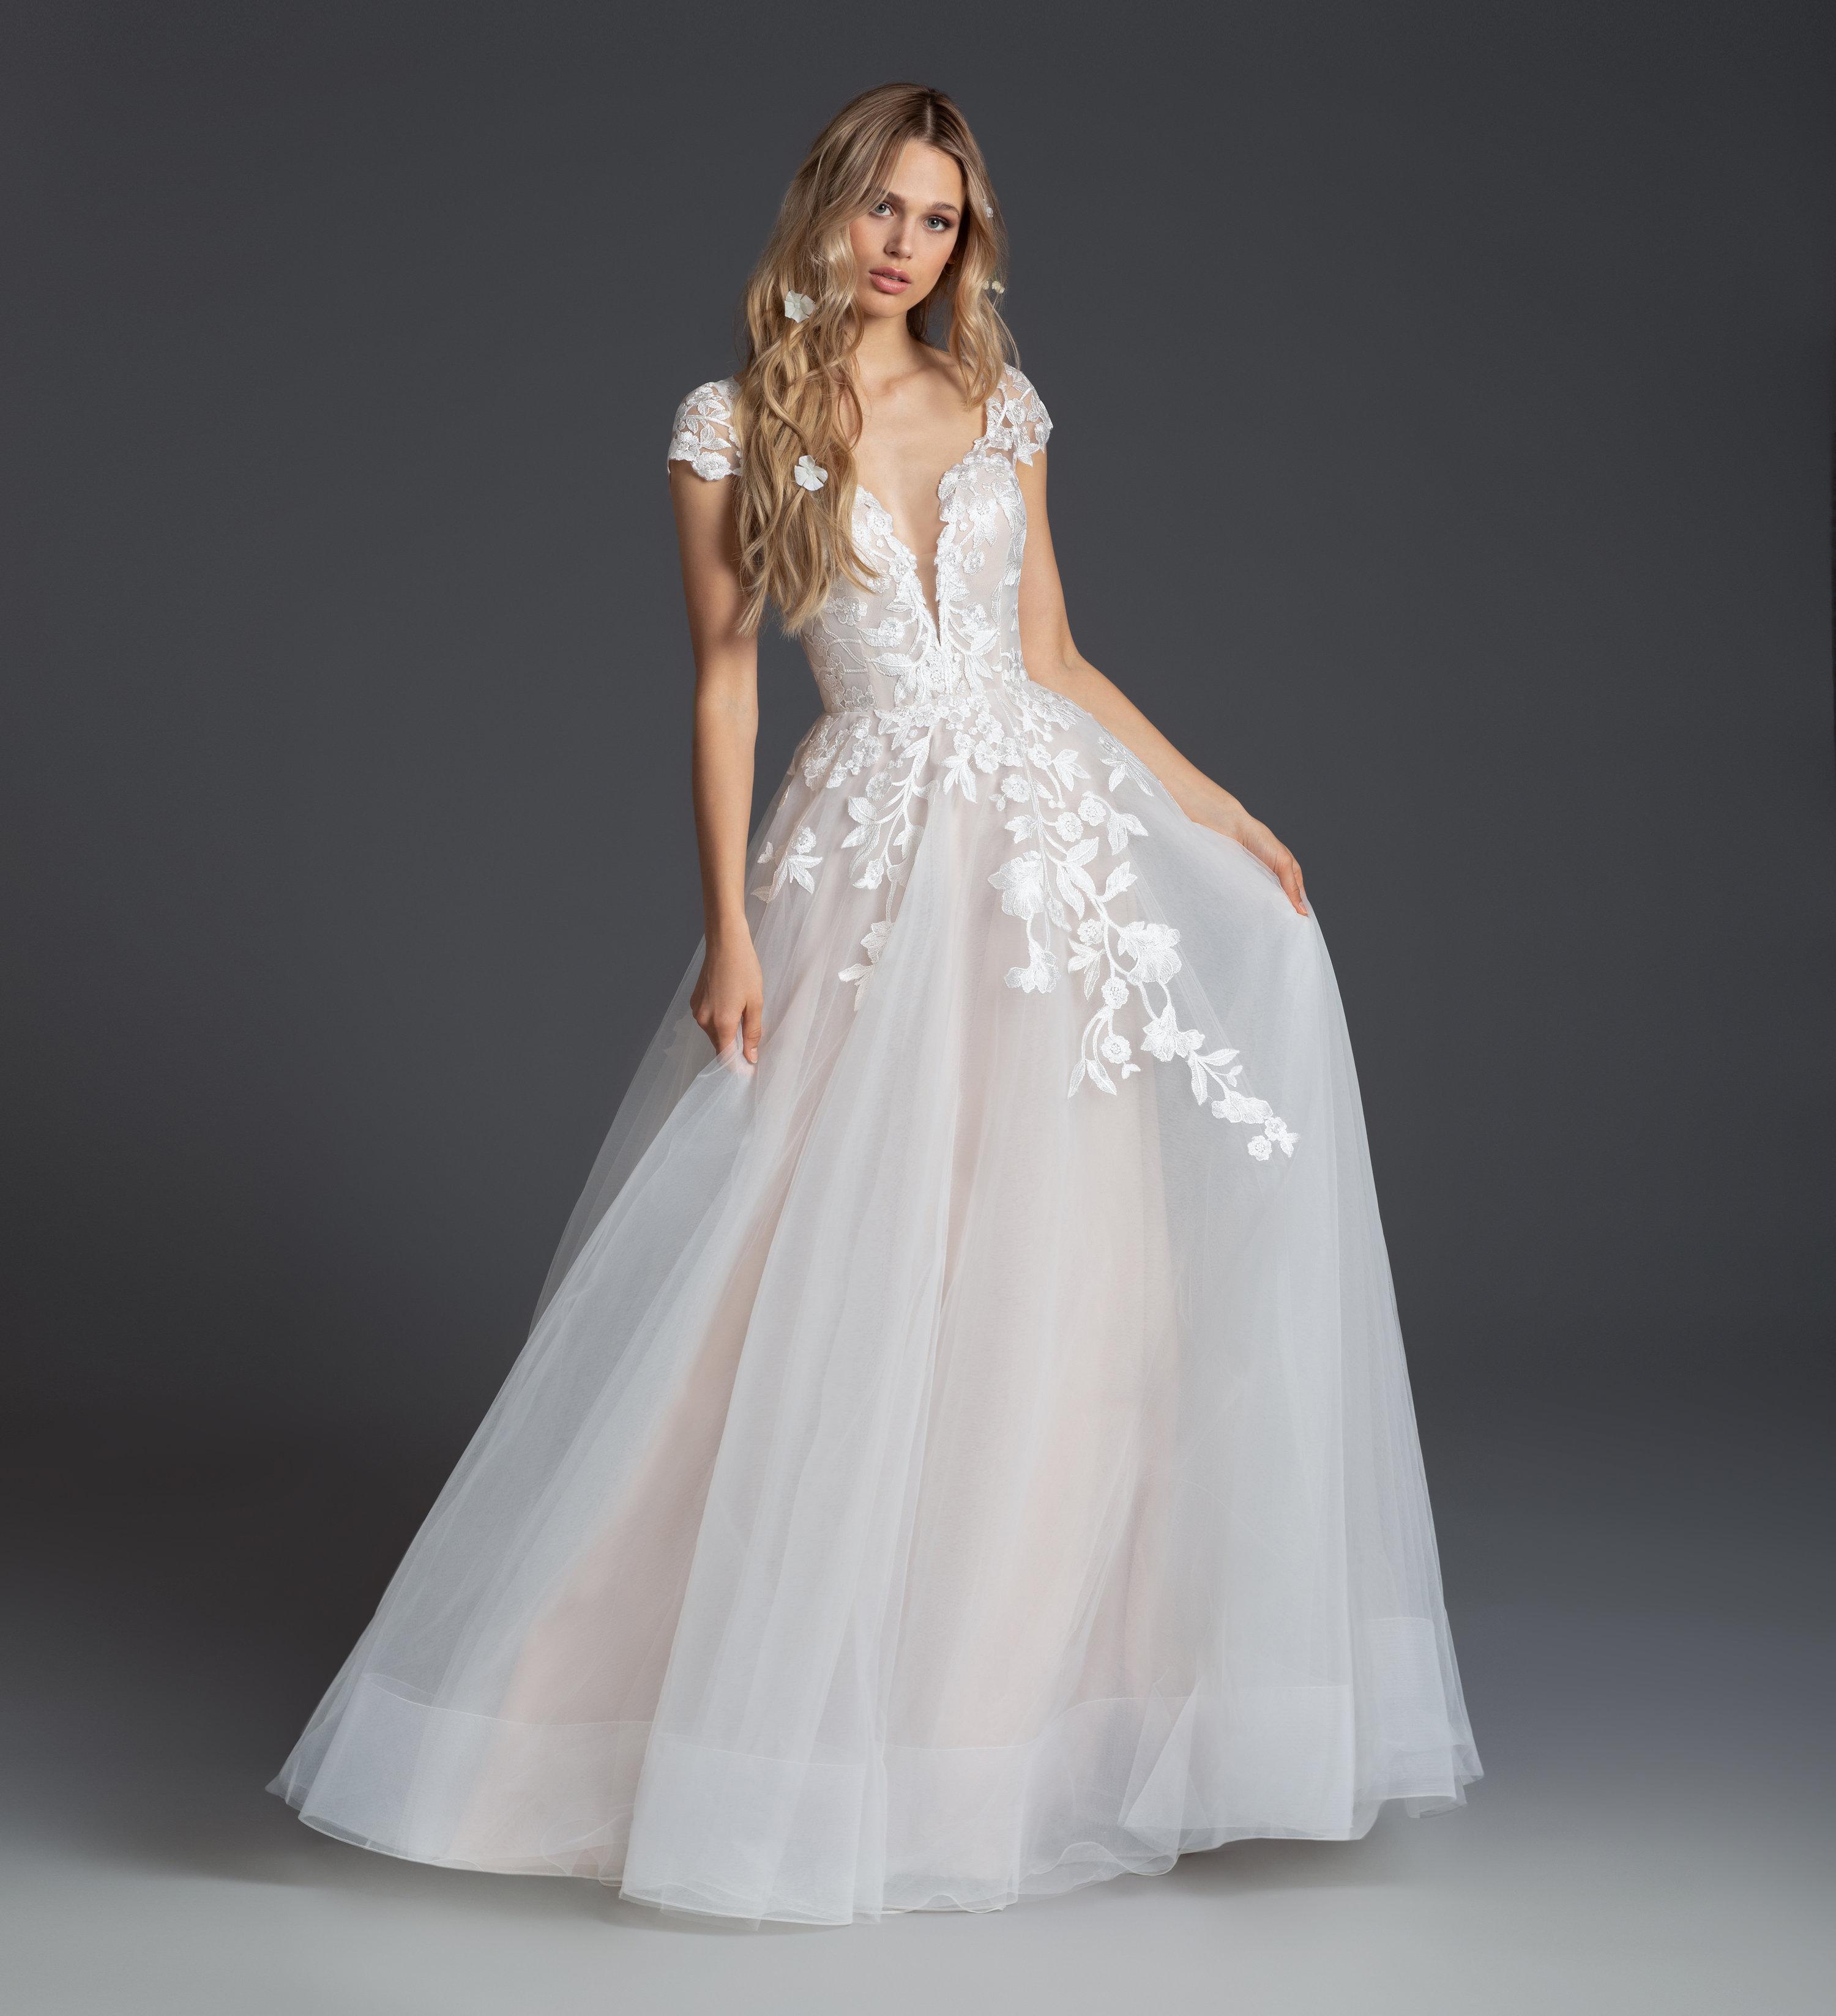 Cap Sleeve V-neckline A-line Wedding Dress With Floral